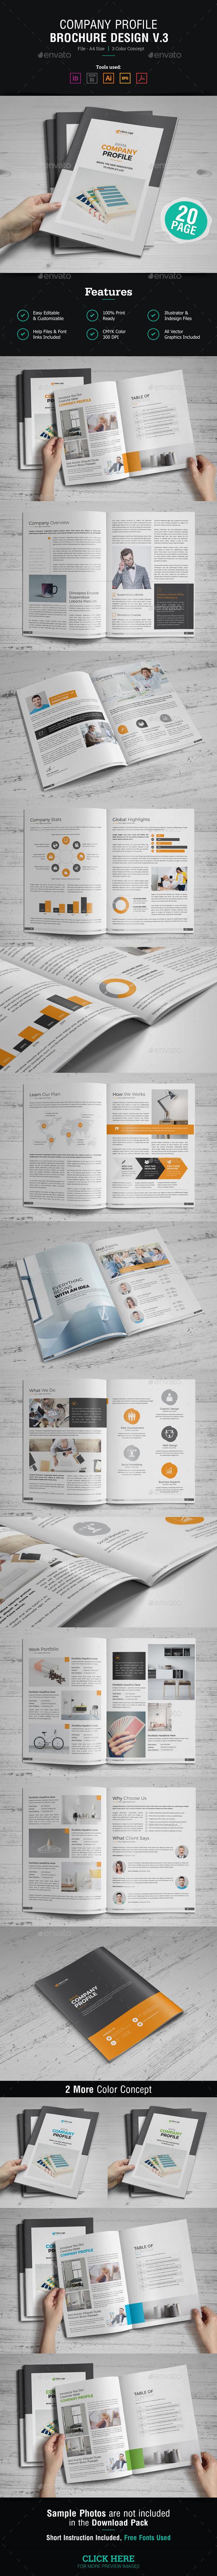 Company Profile Brochure Design v3 - Corporate Brochures